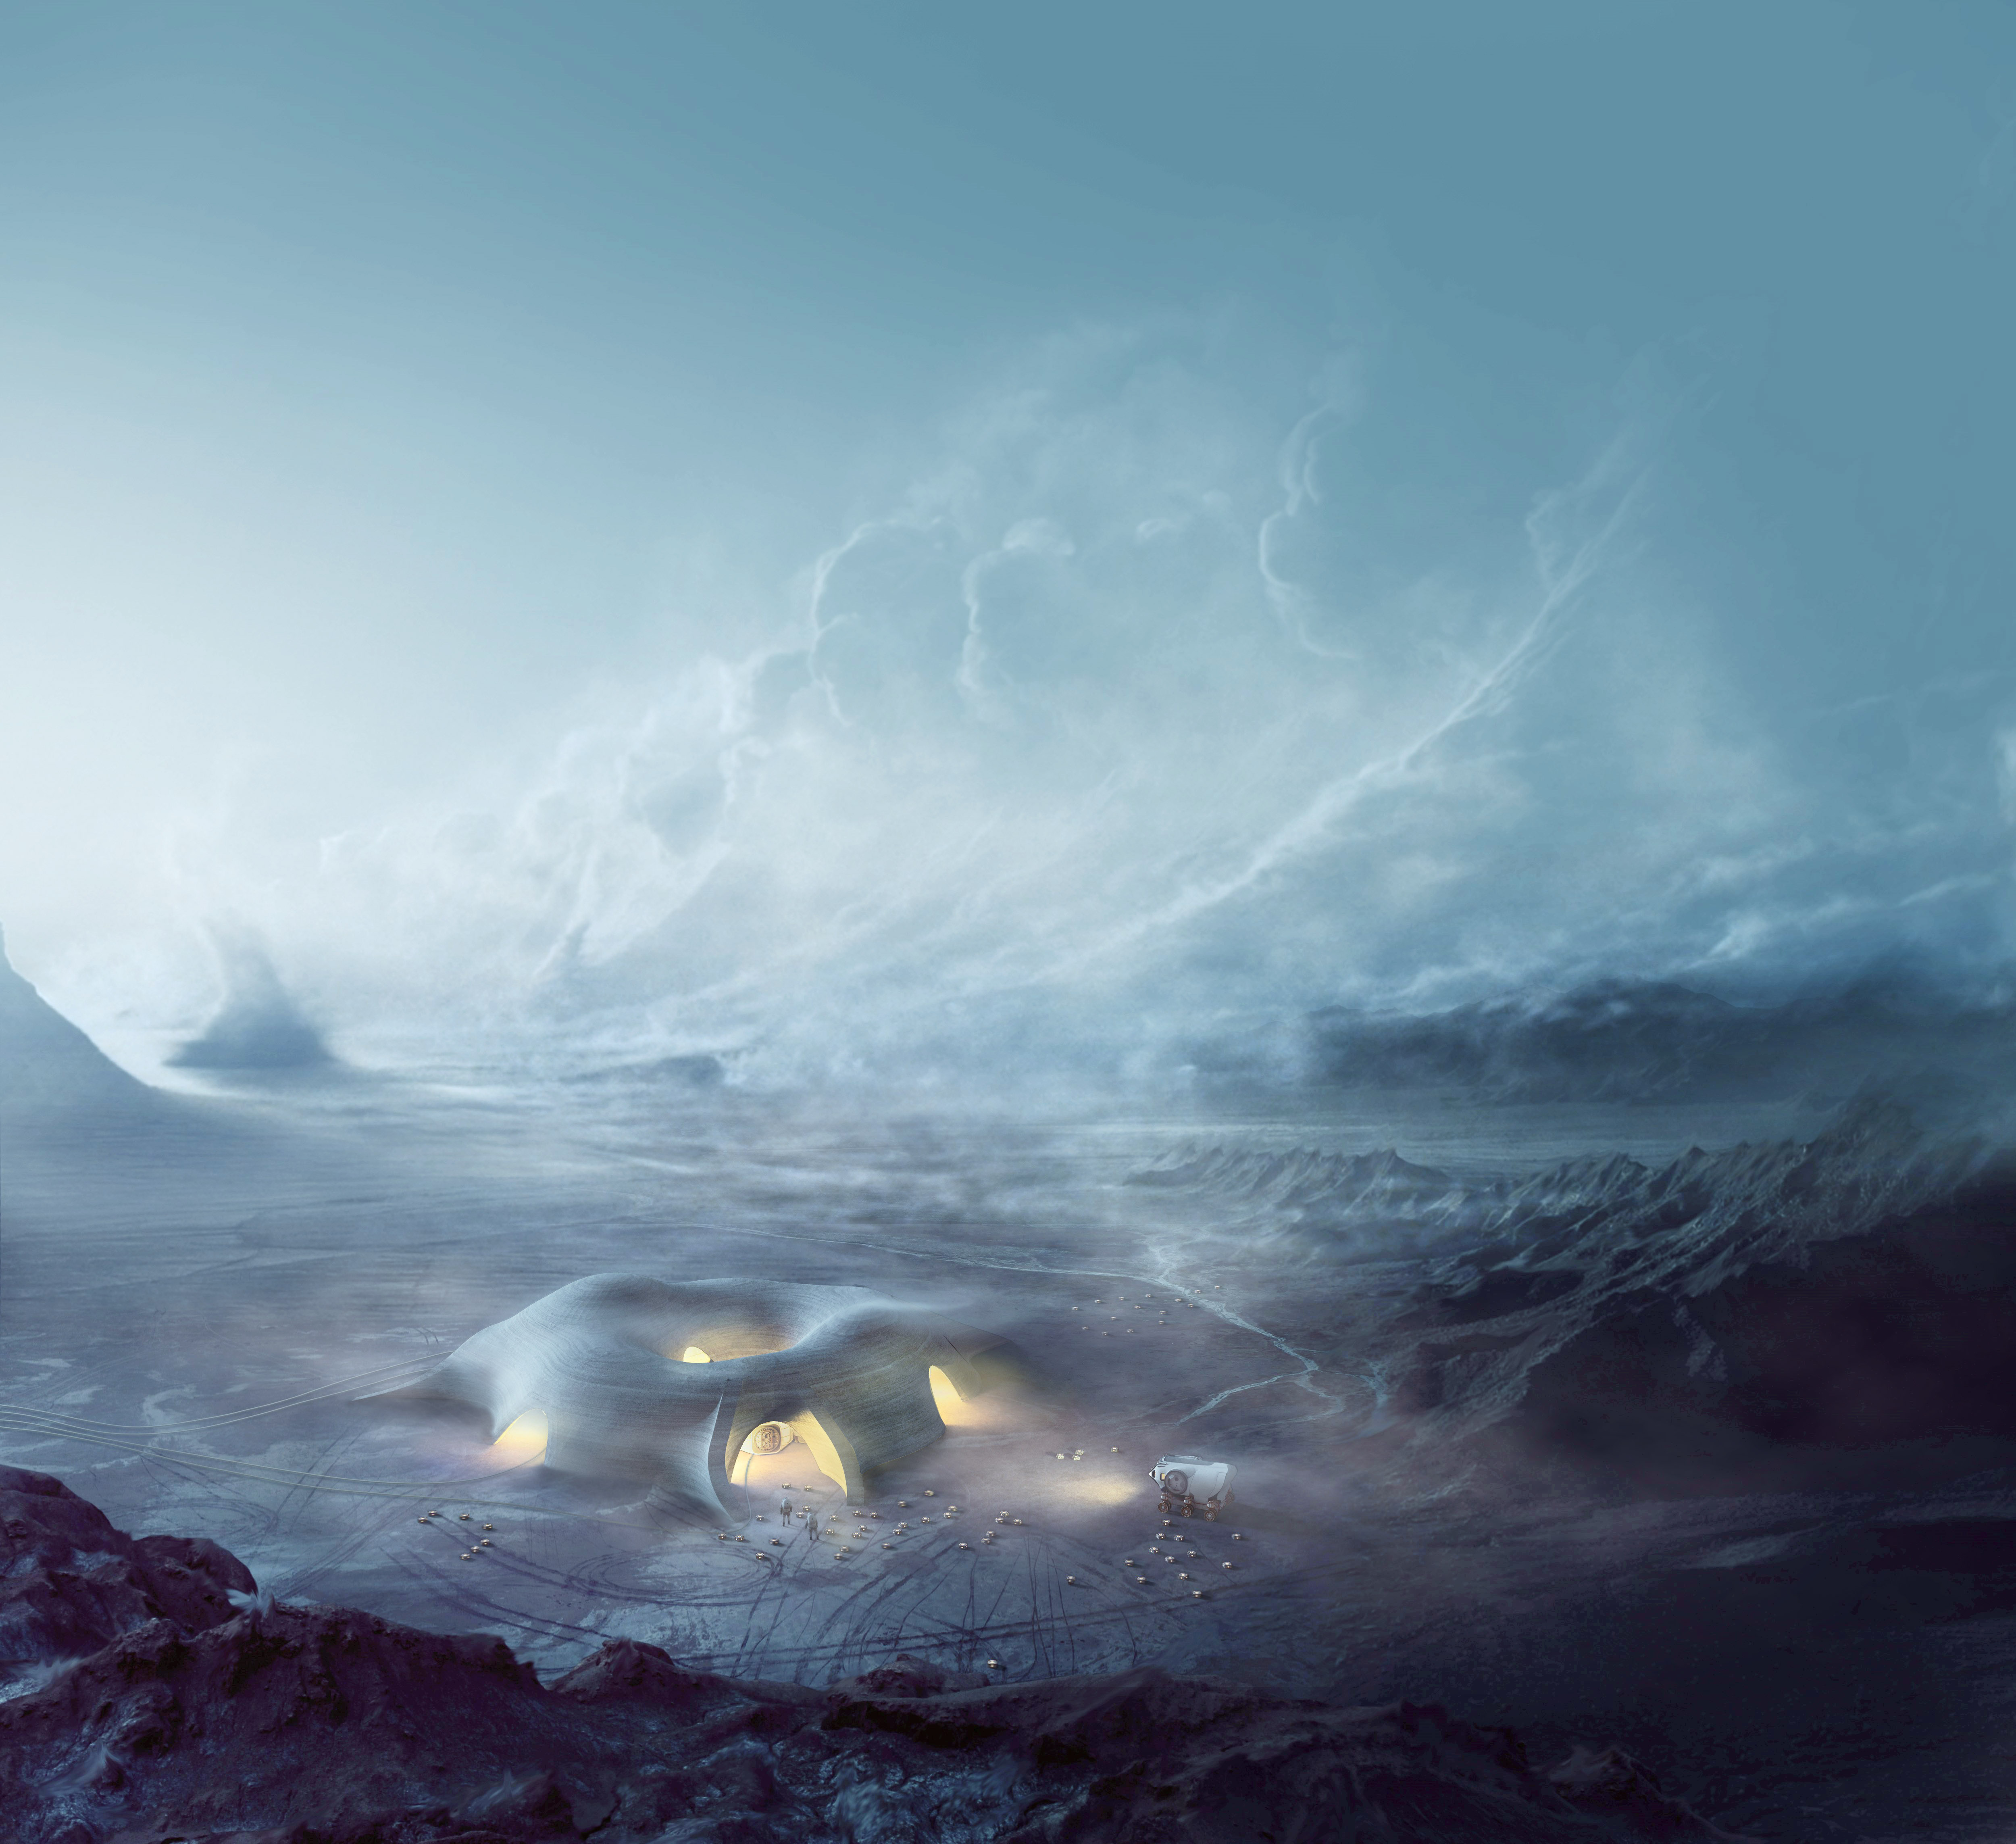 Mars habitat by Hassell